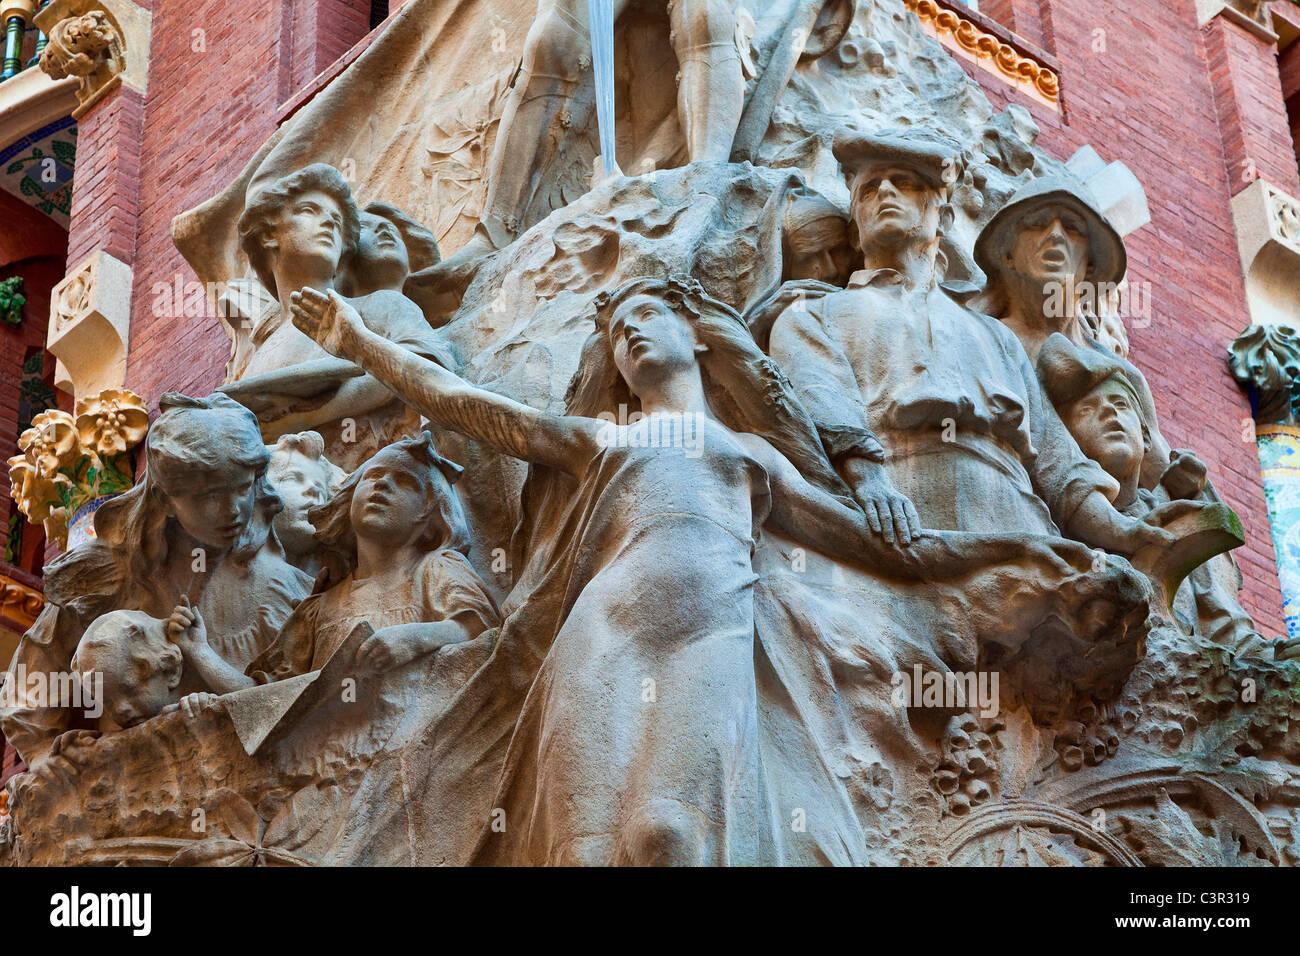 Barcelona, Palau de la Musica - Stock Image